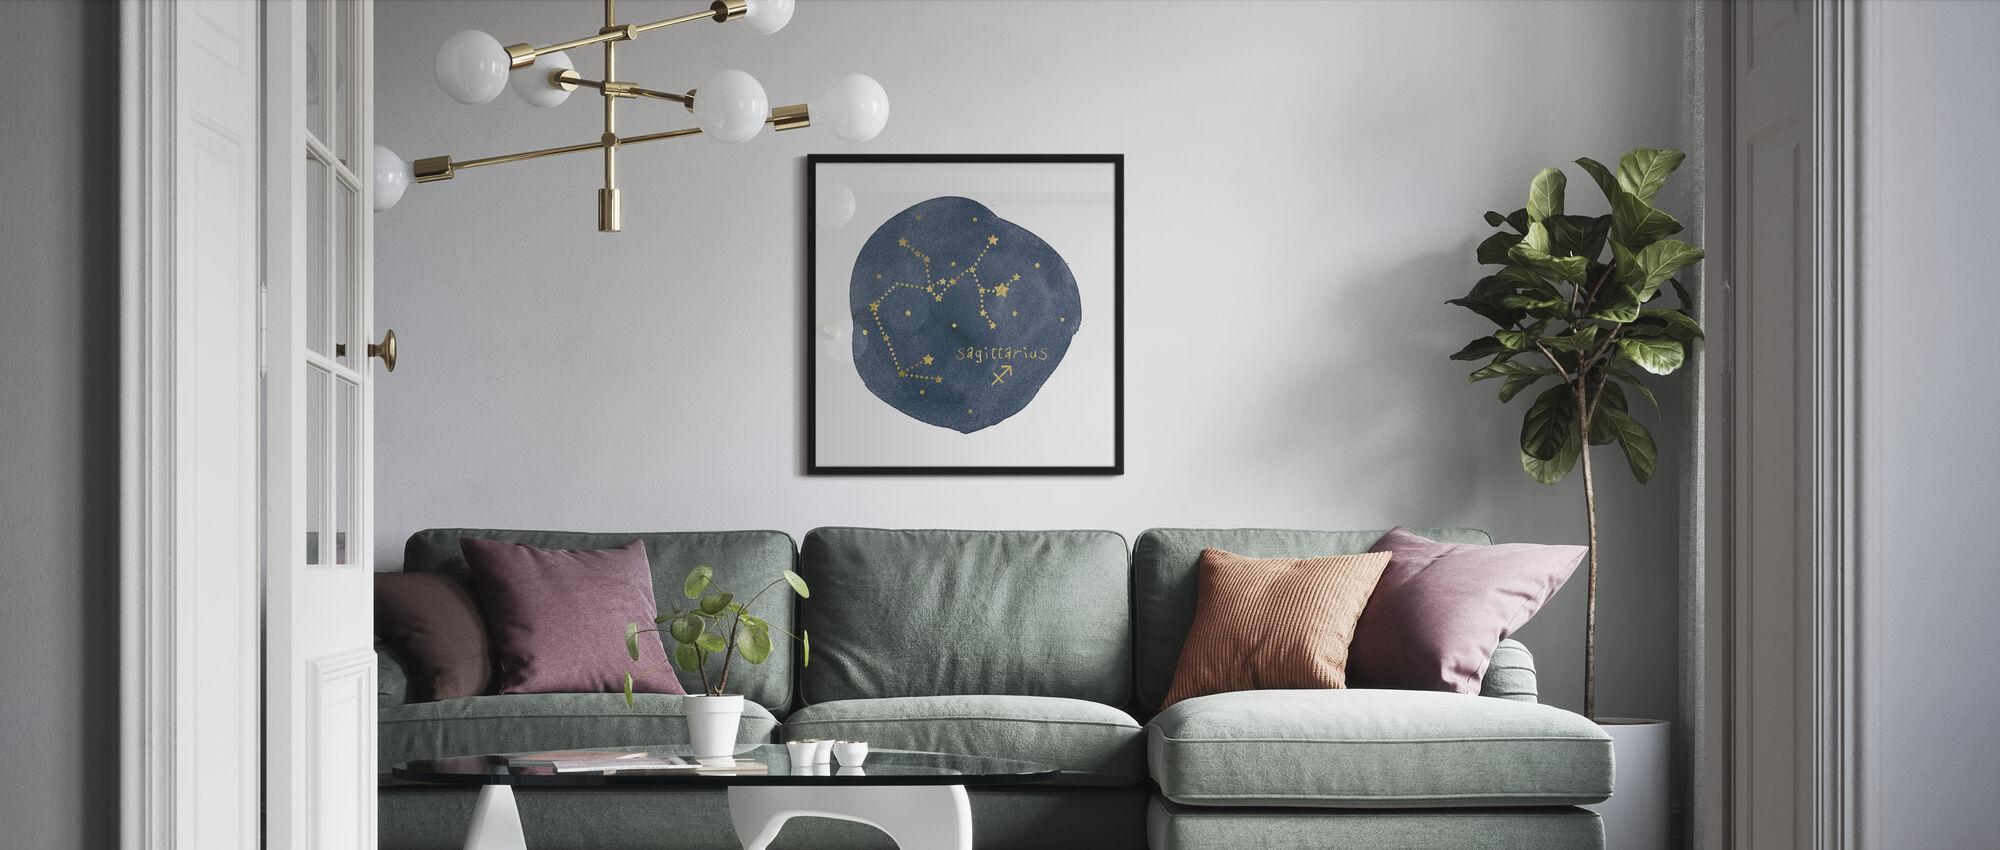 Horoskop Skytten - Innrammet bilde - Stue